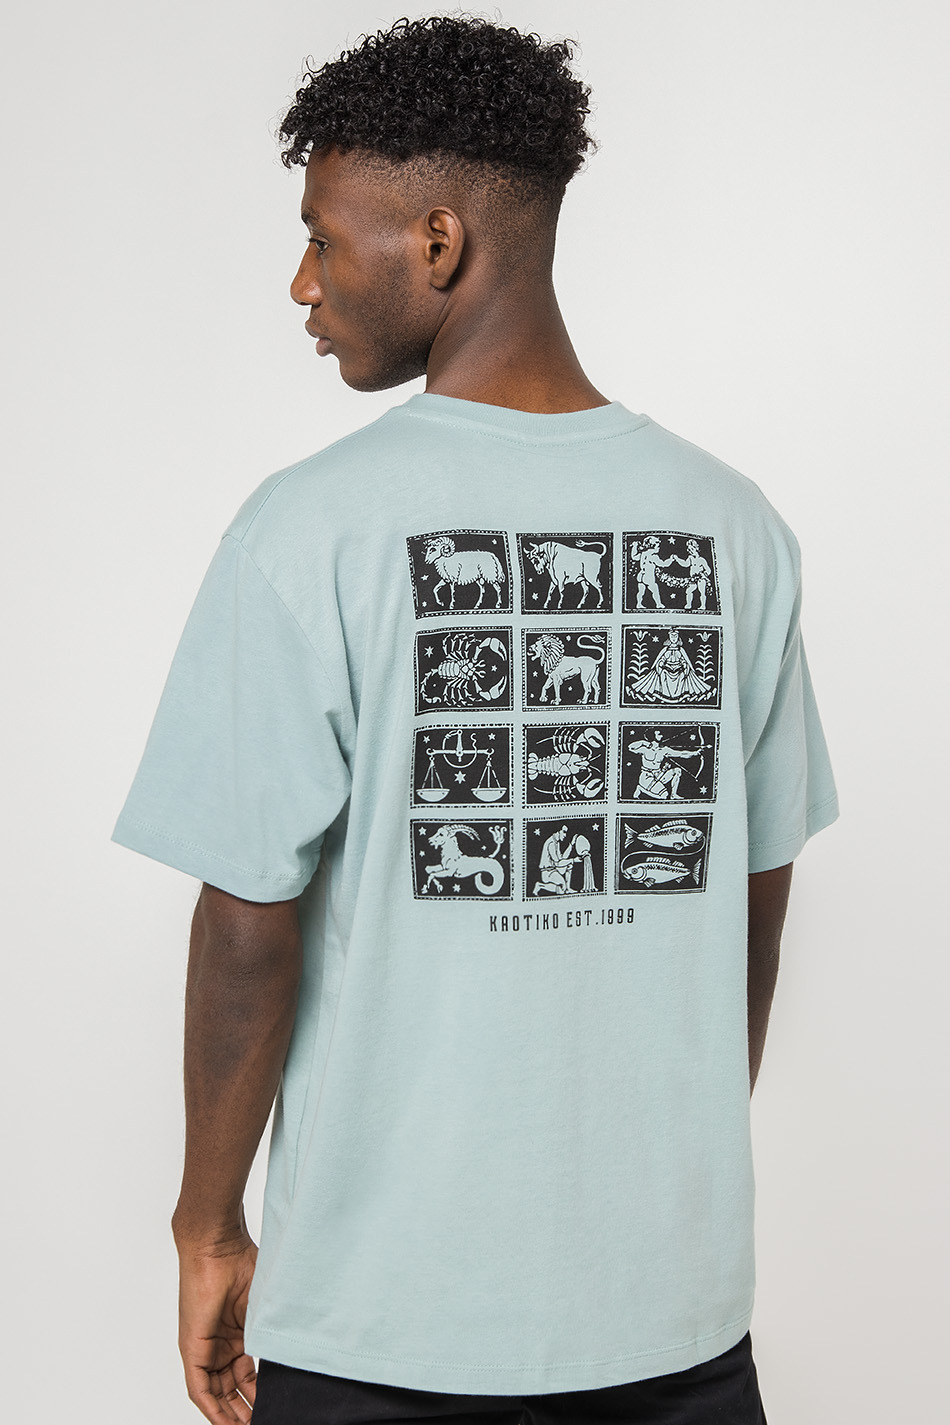 Horoscope logos t-shirt